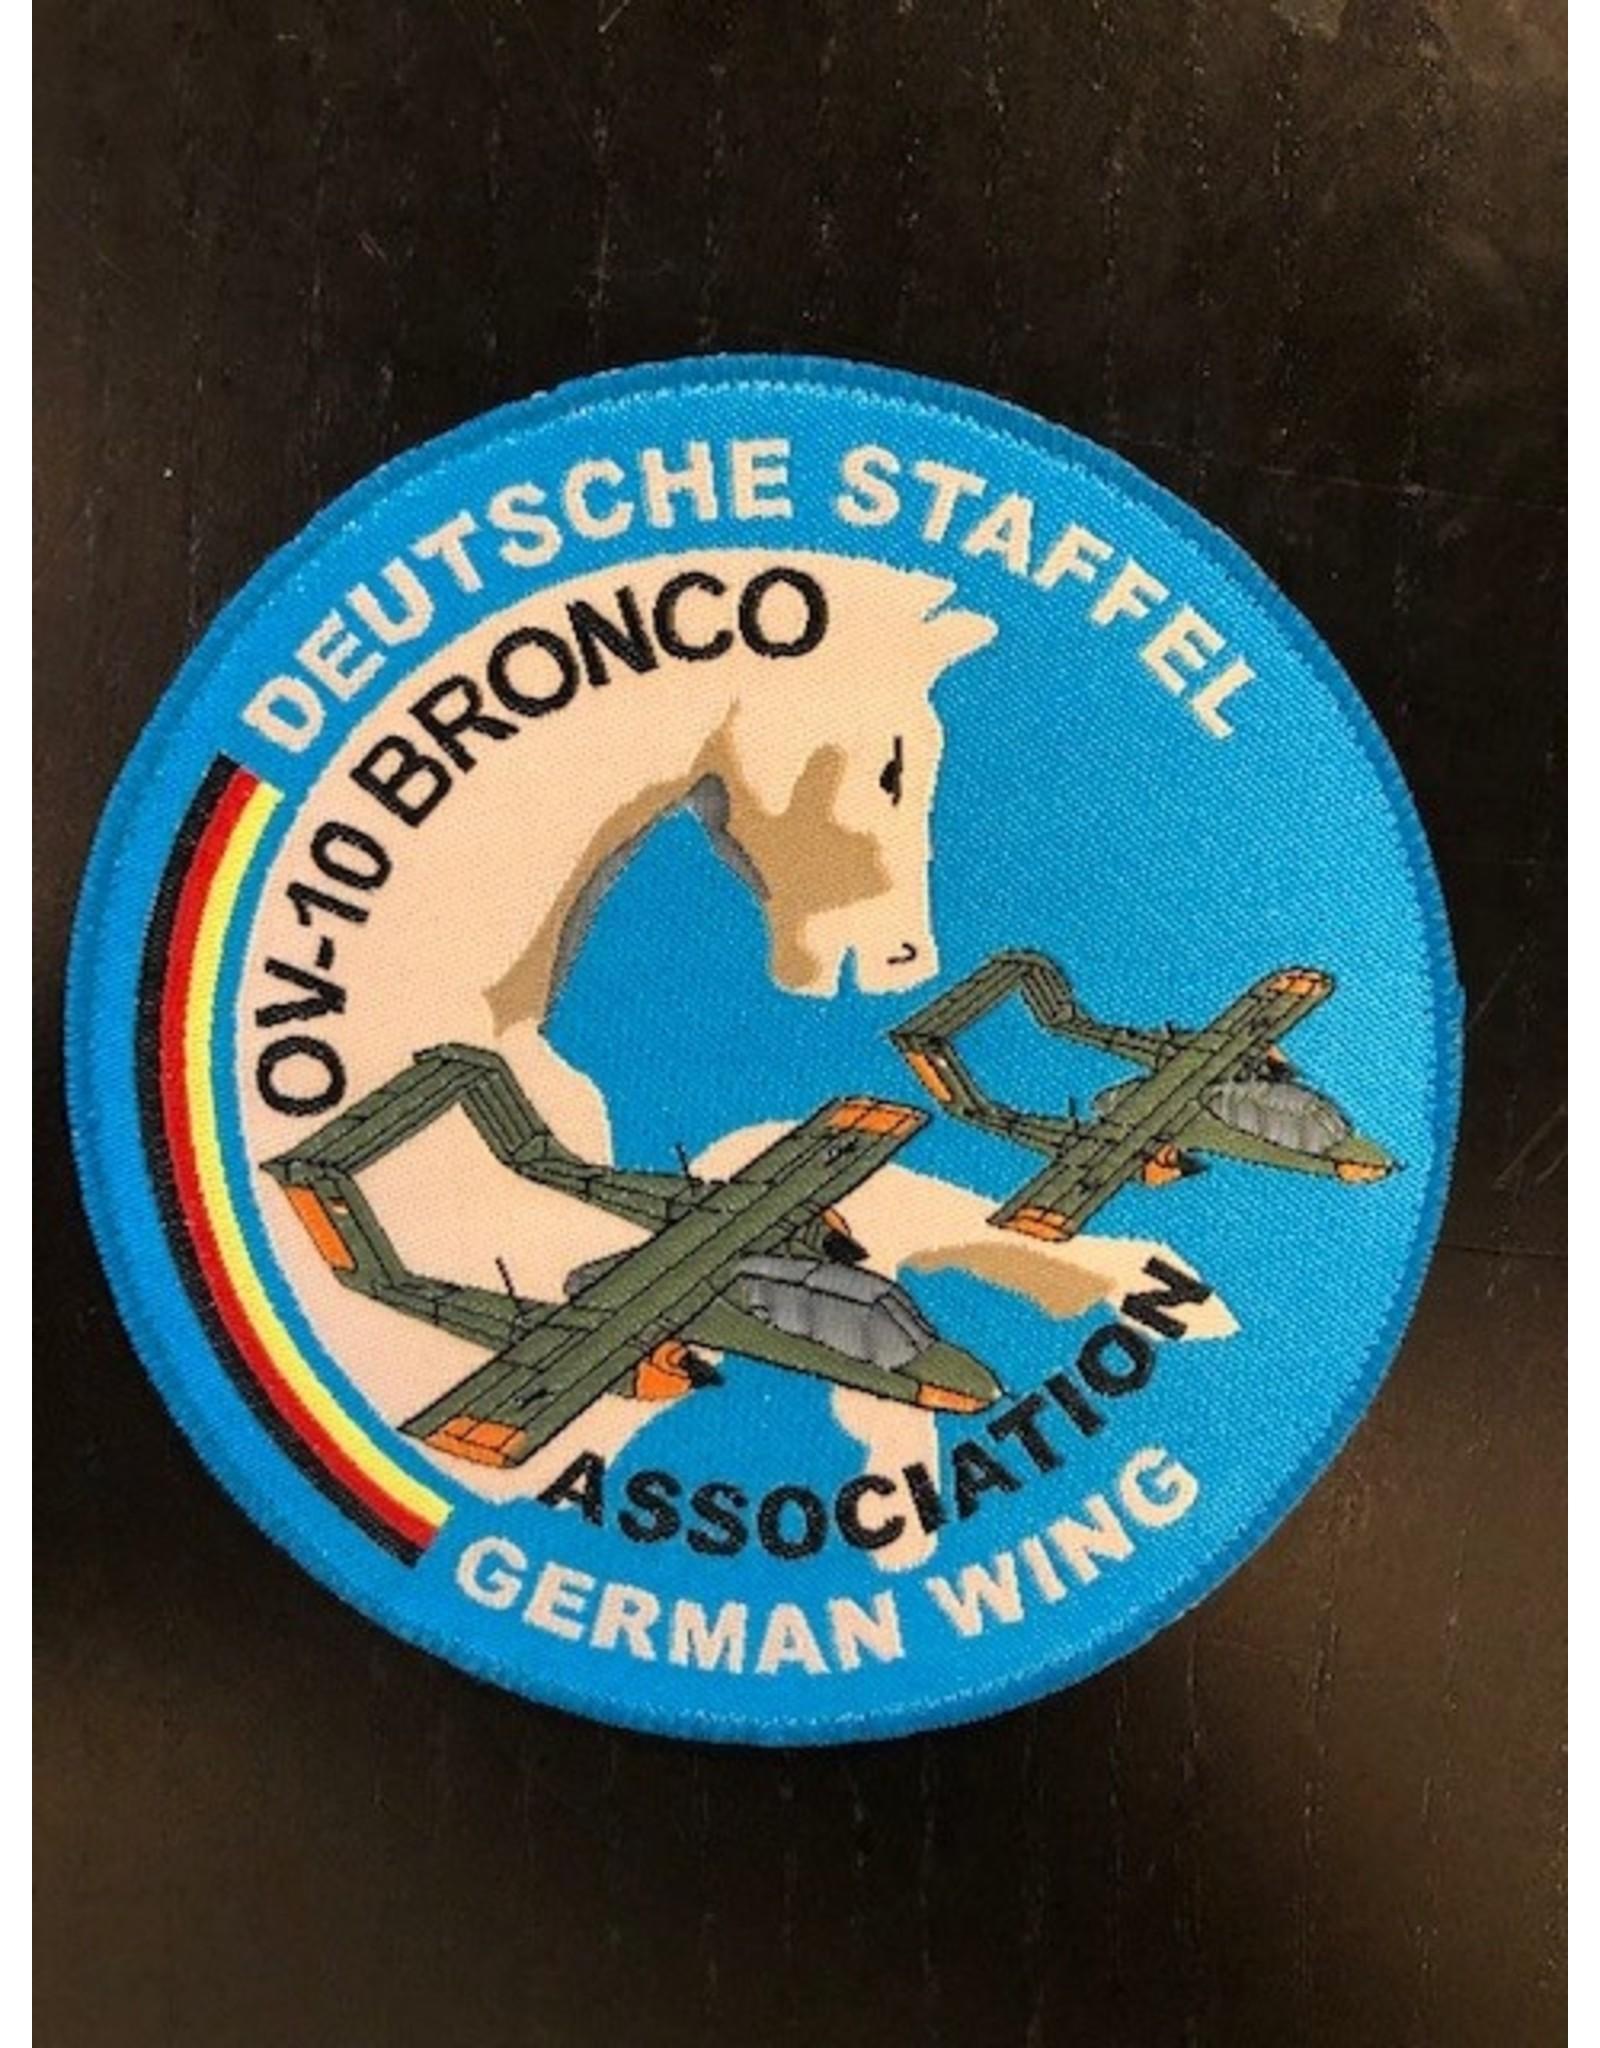 FWAM OBA German Wing (20), patch